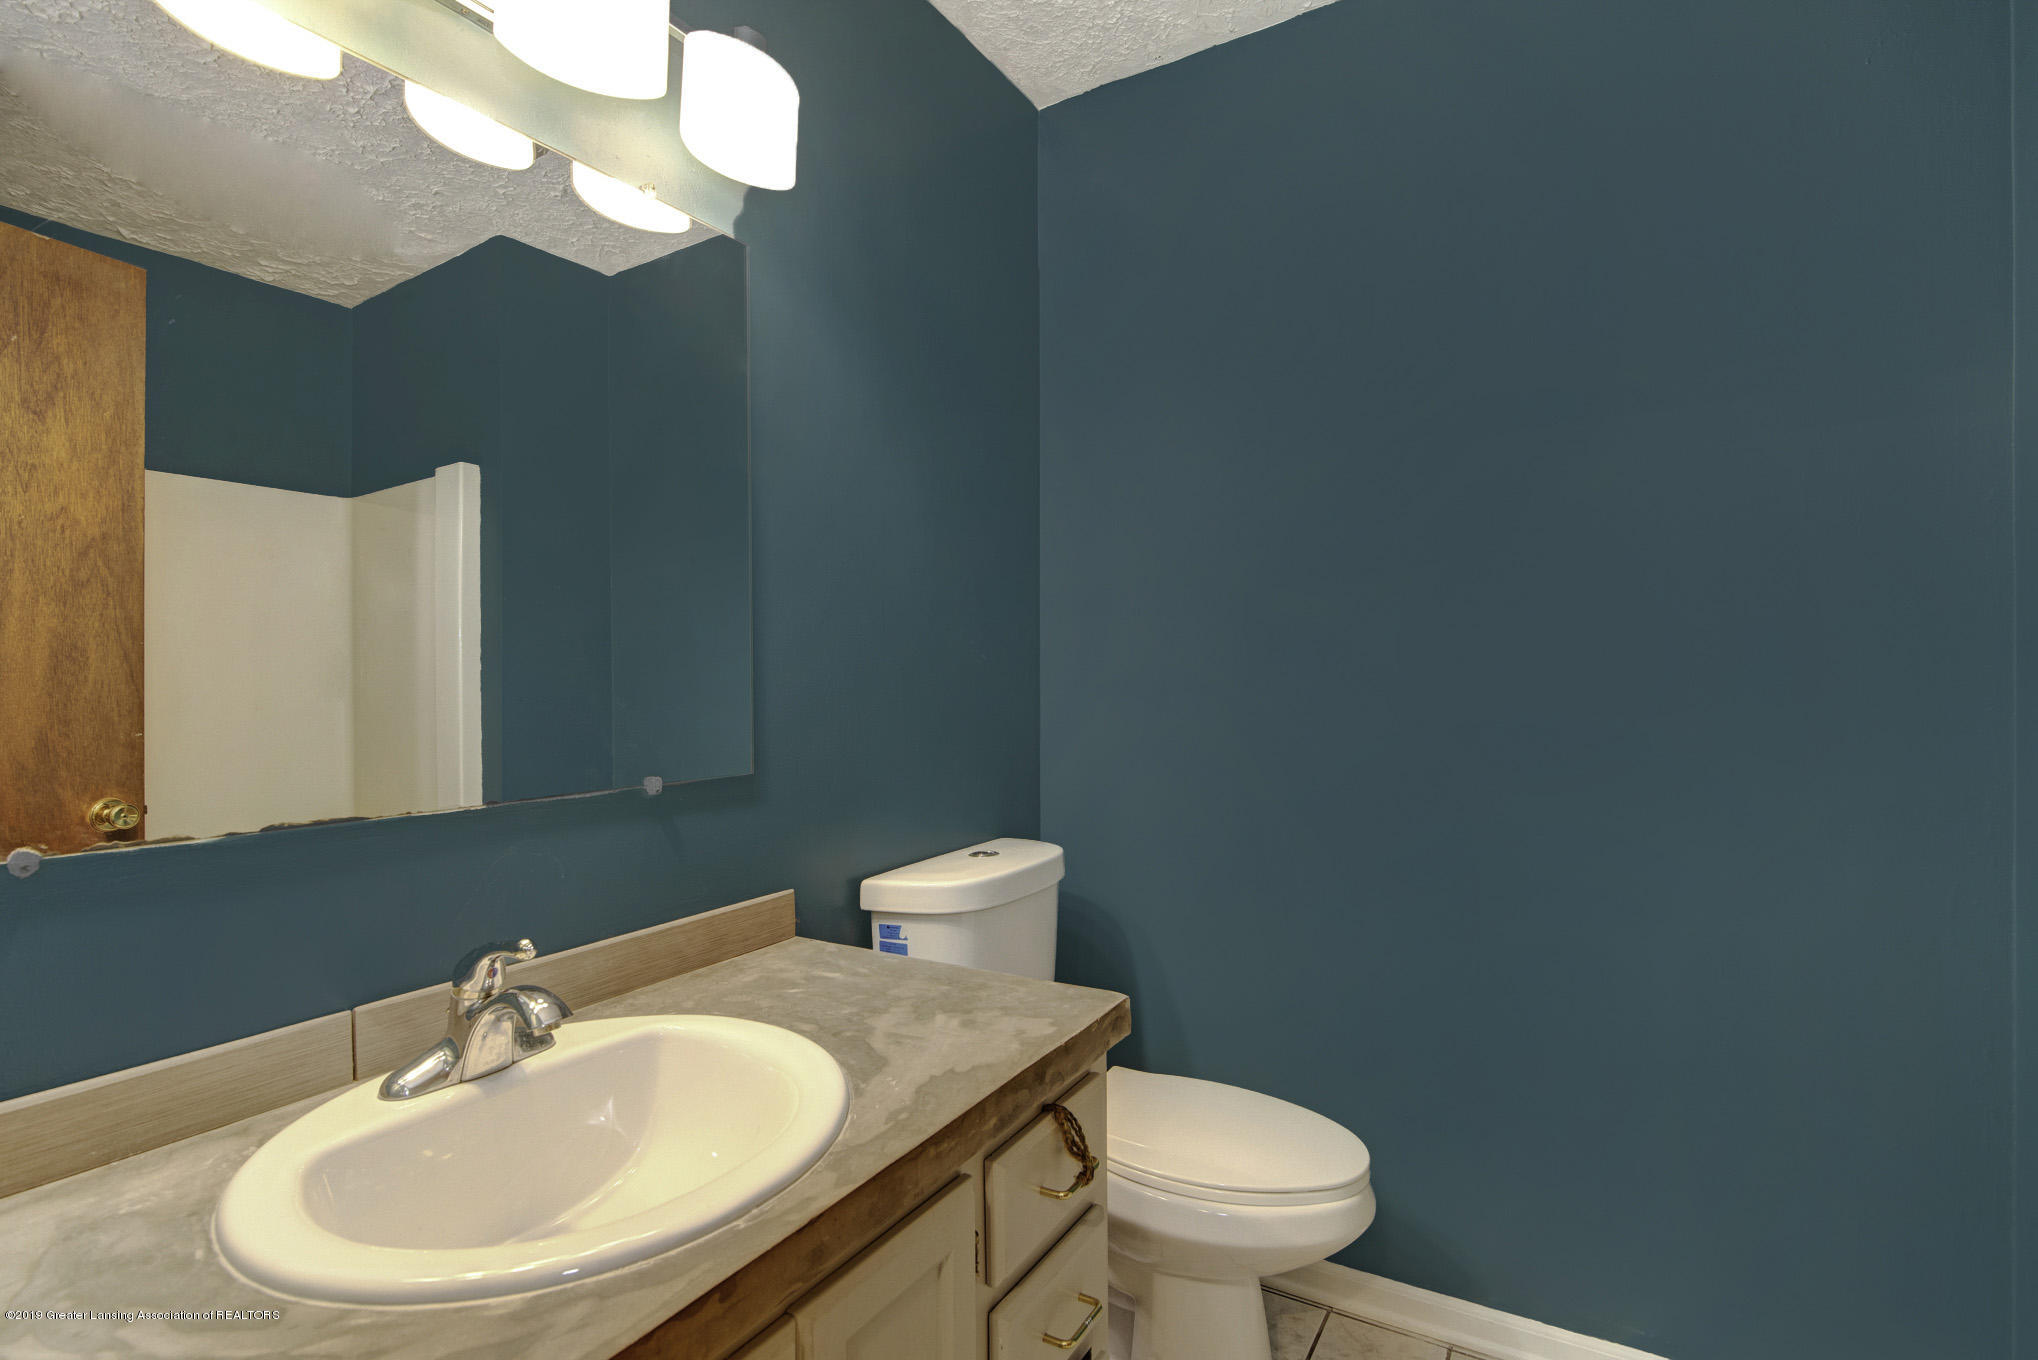 1417 Spearberry Ln - Bathroom - 19